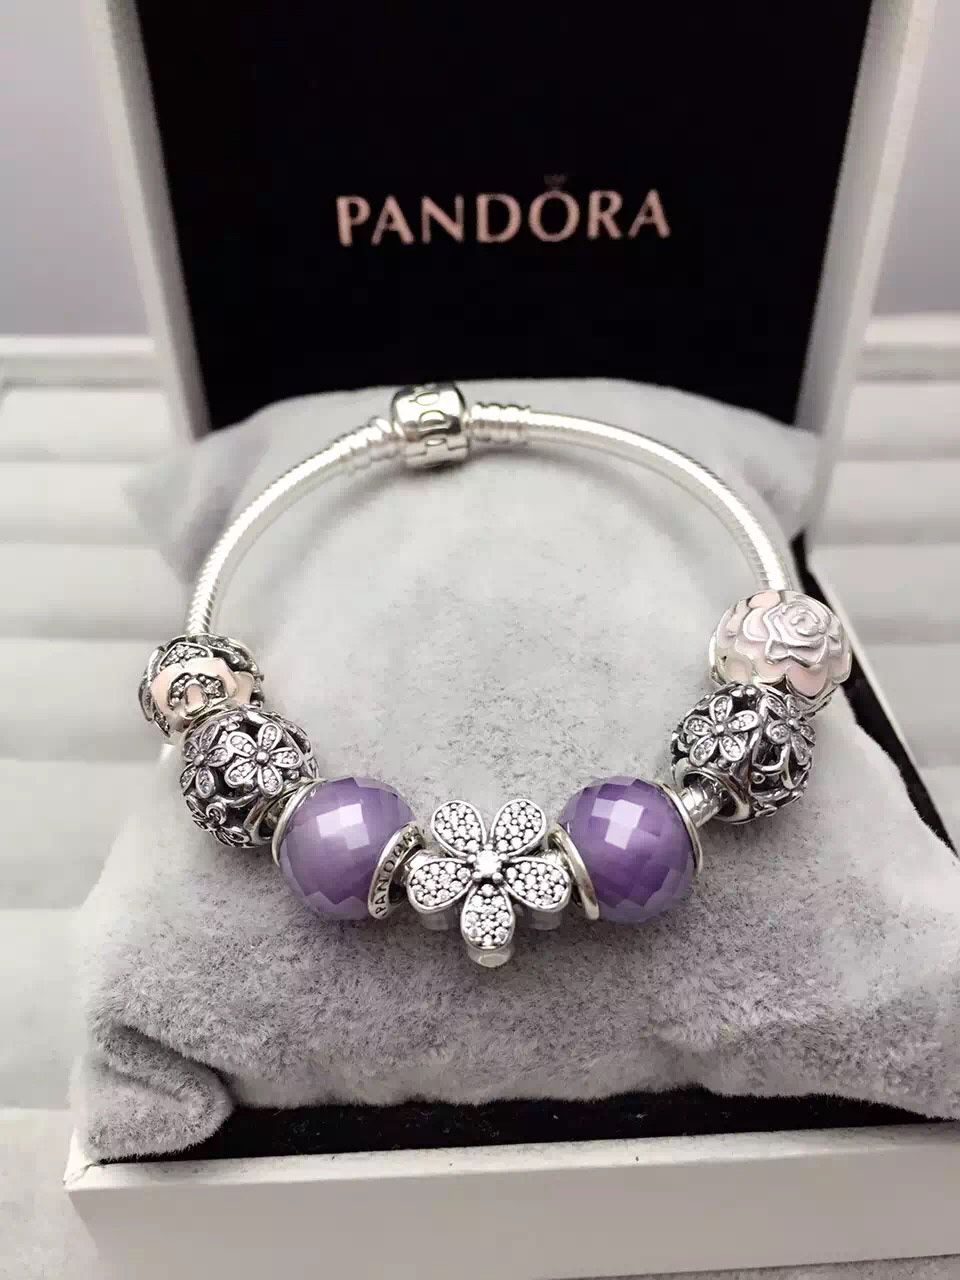 f8f386304ec62 50% OFF!!! $199 Pandora Charm Bracelet Purple Pink. Hot Sale!!! SKU ...